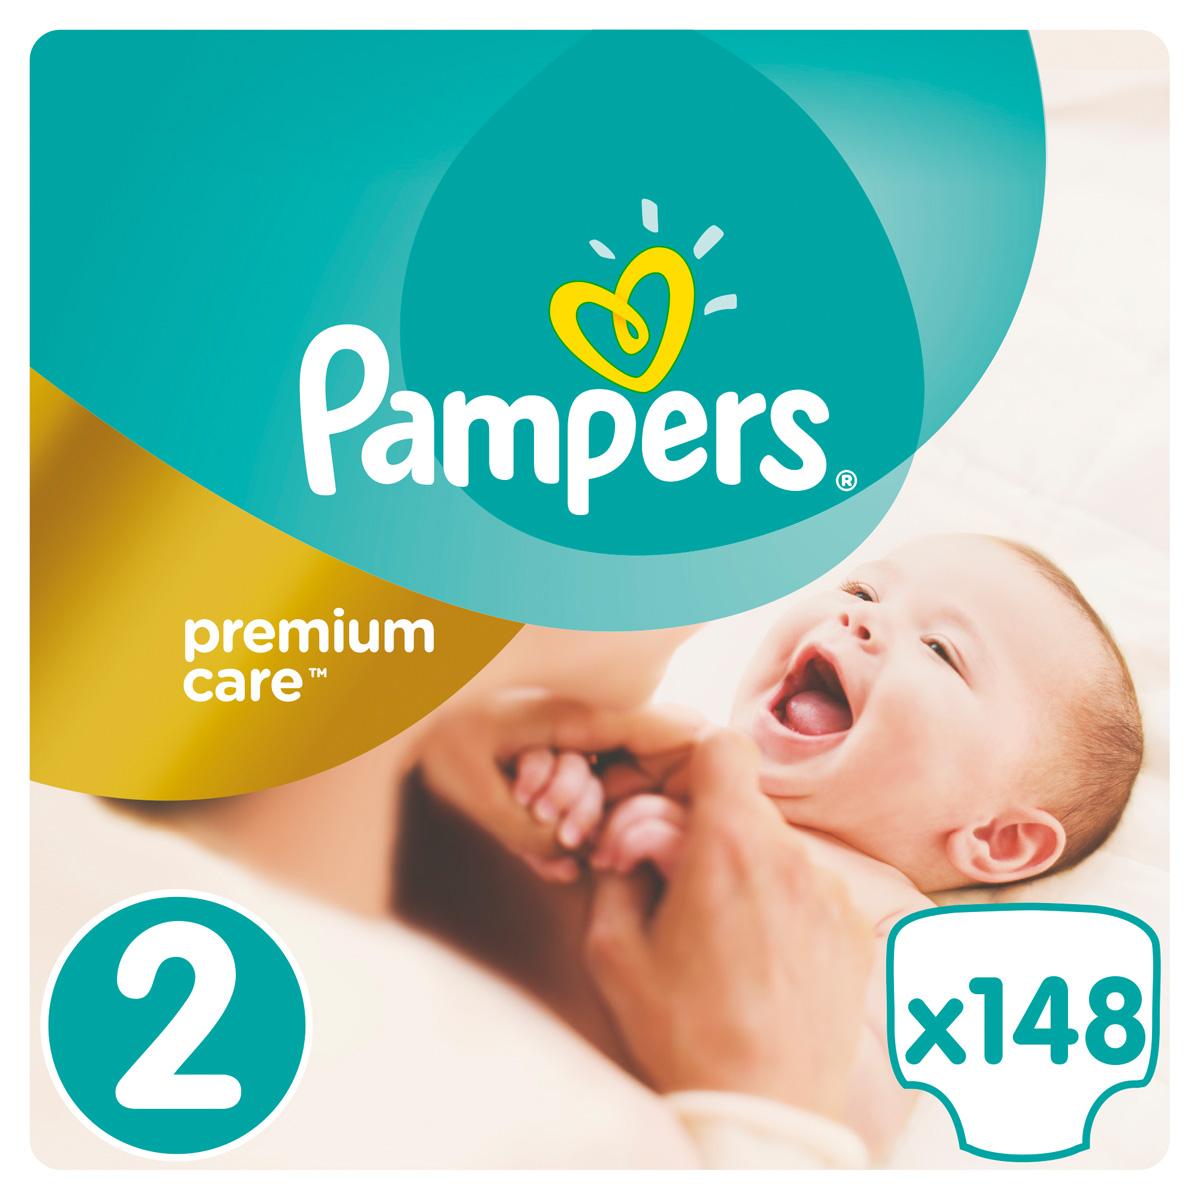 Pampers Подгузники Premium Care 3-6 кг (размер 2) 148 шт